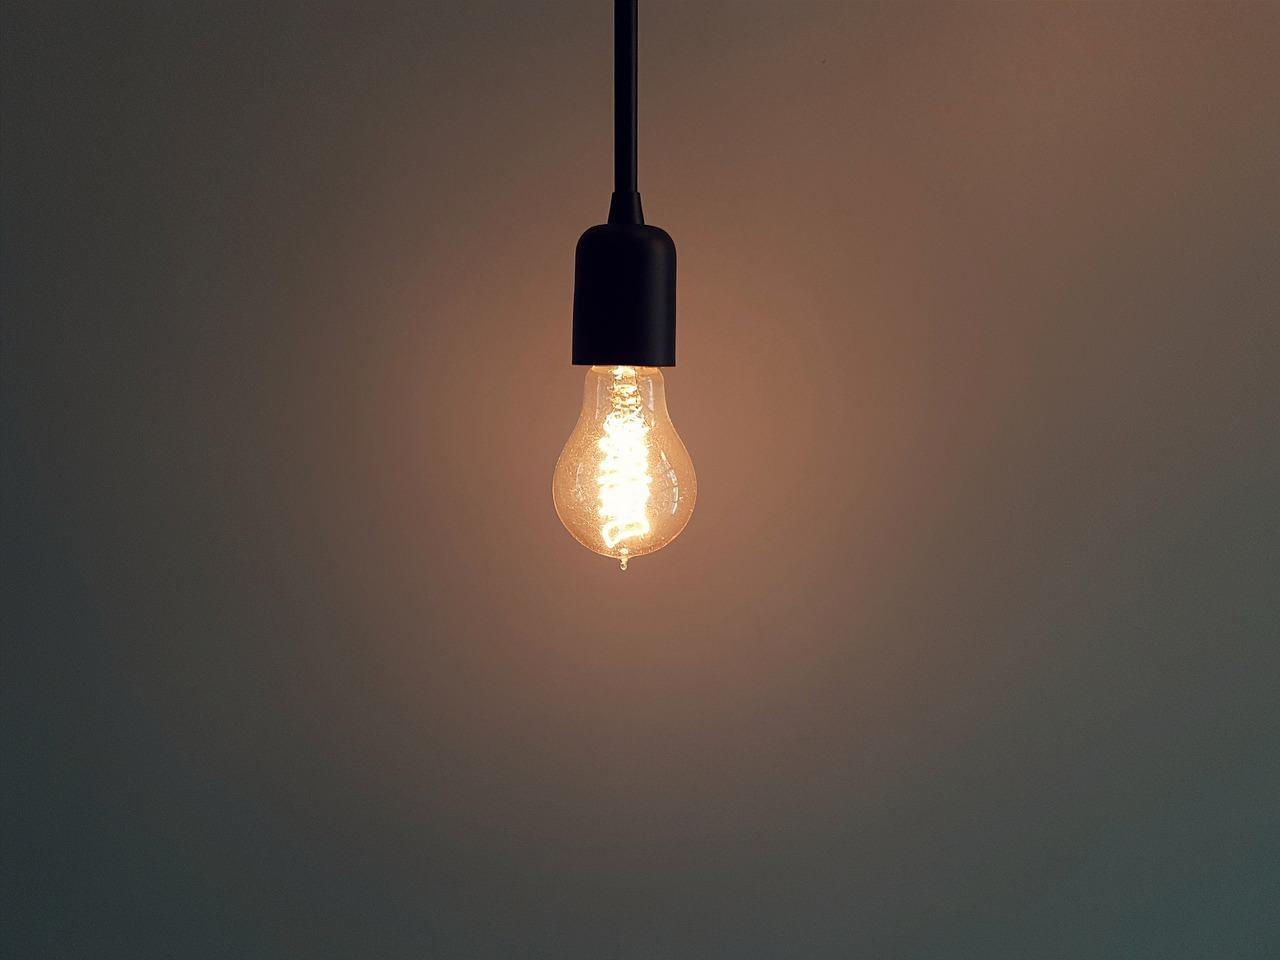 Electricitate - Sursa: Pixabay